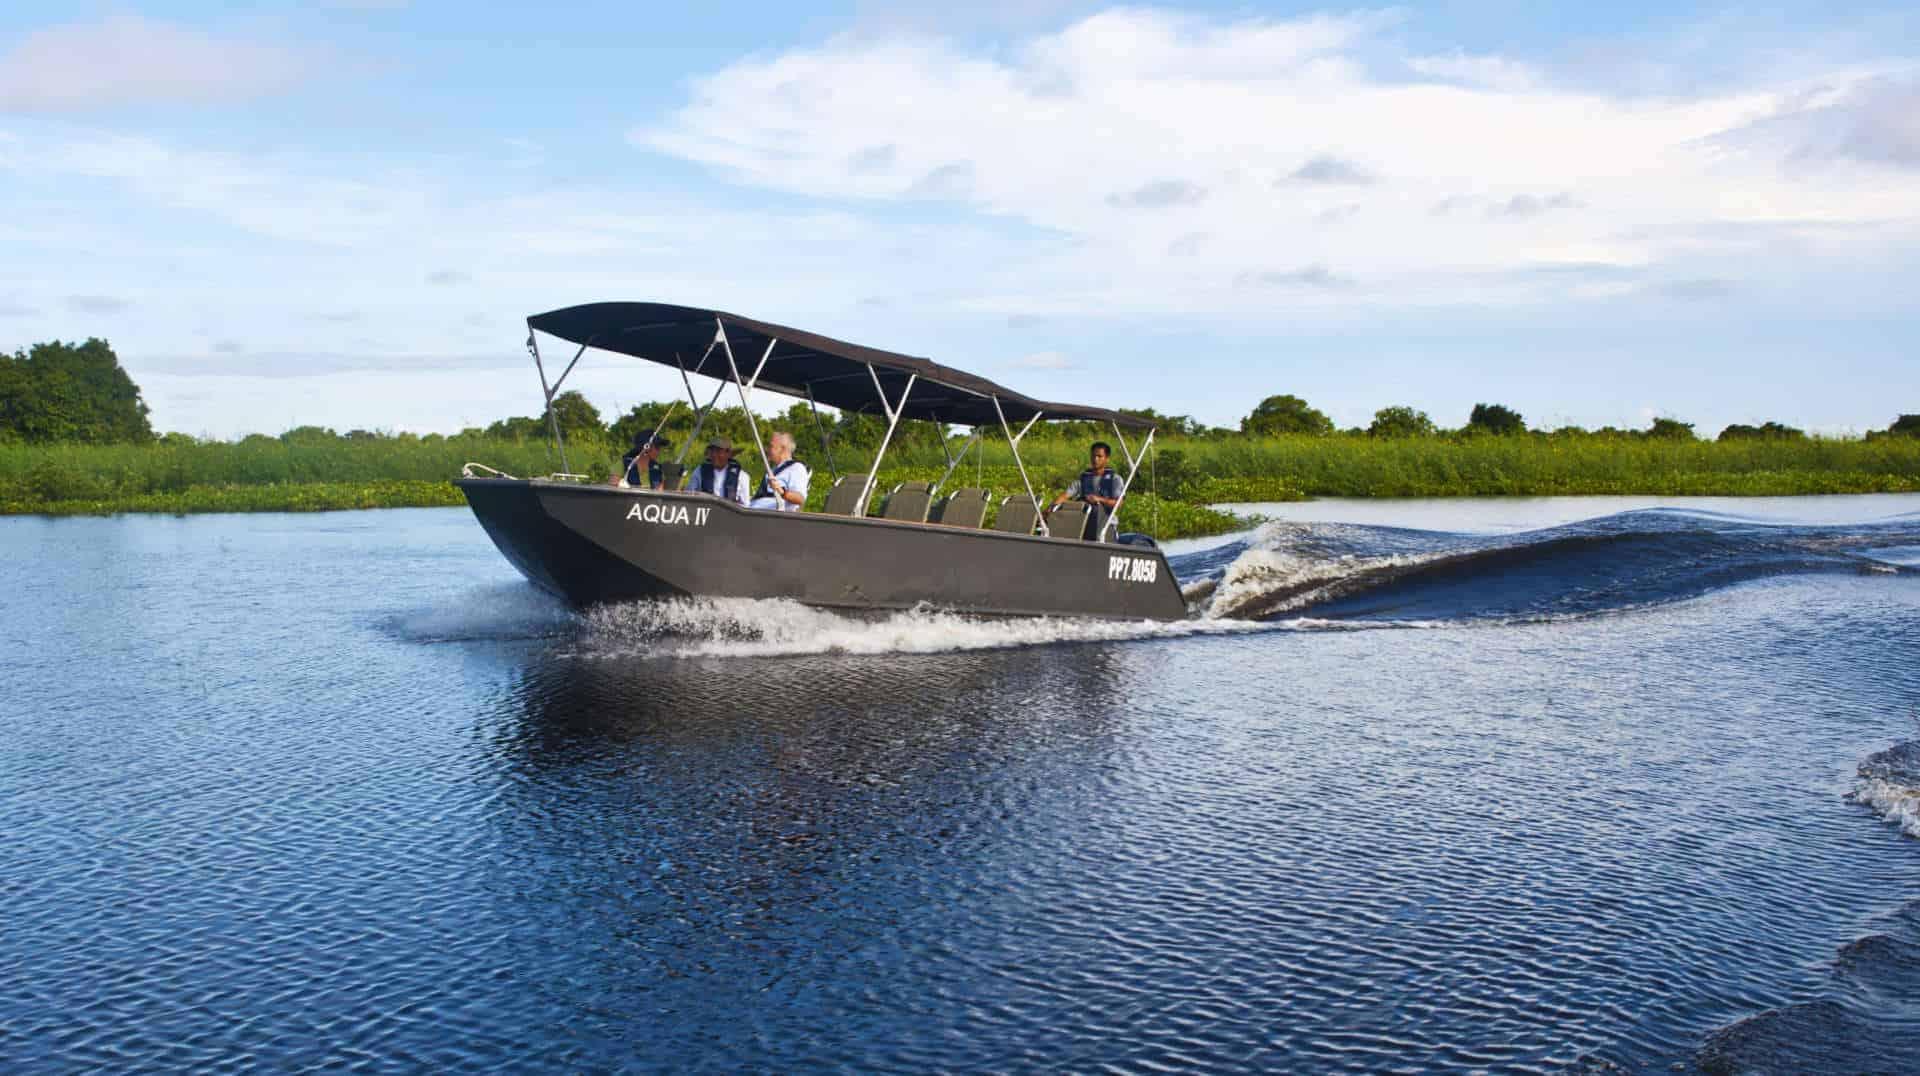 Aqua Mekong Tender